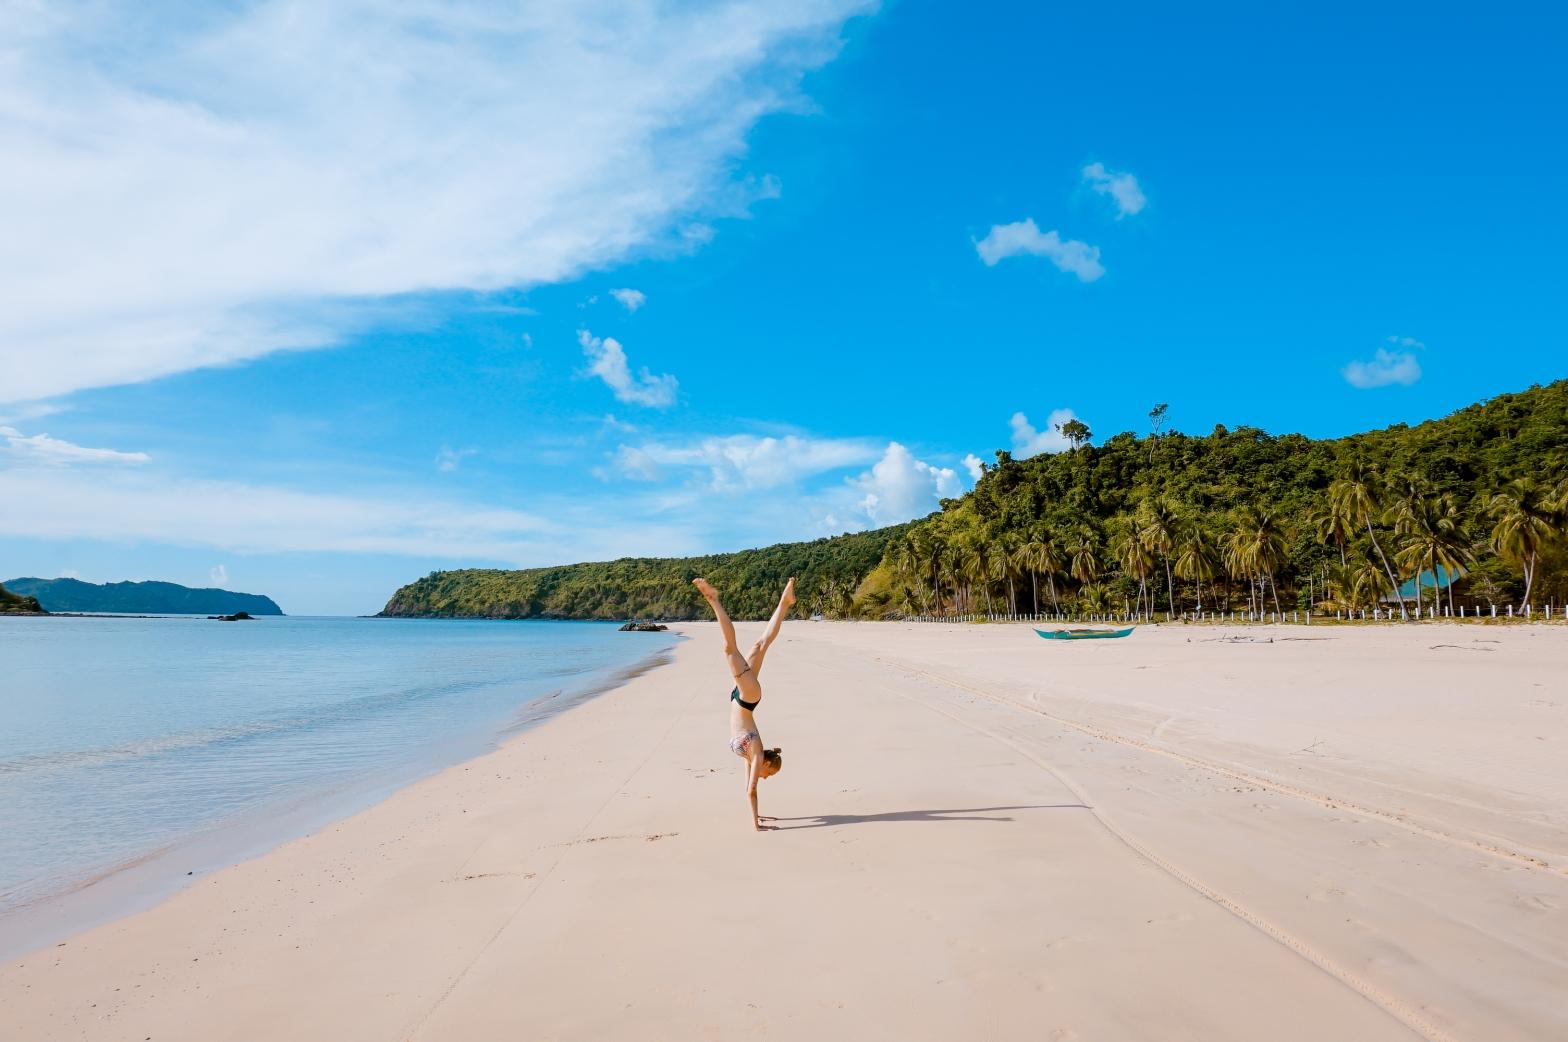 woman in bikini doing handstand on a tropical beach